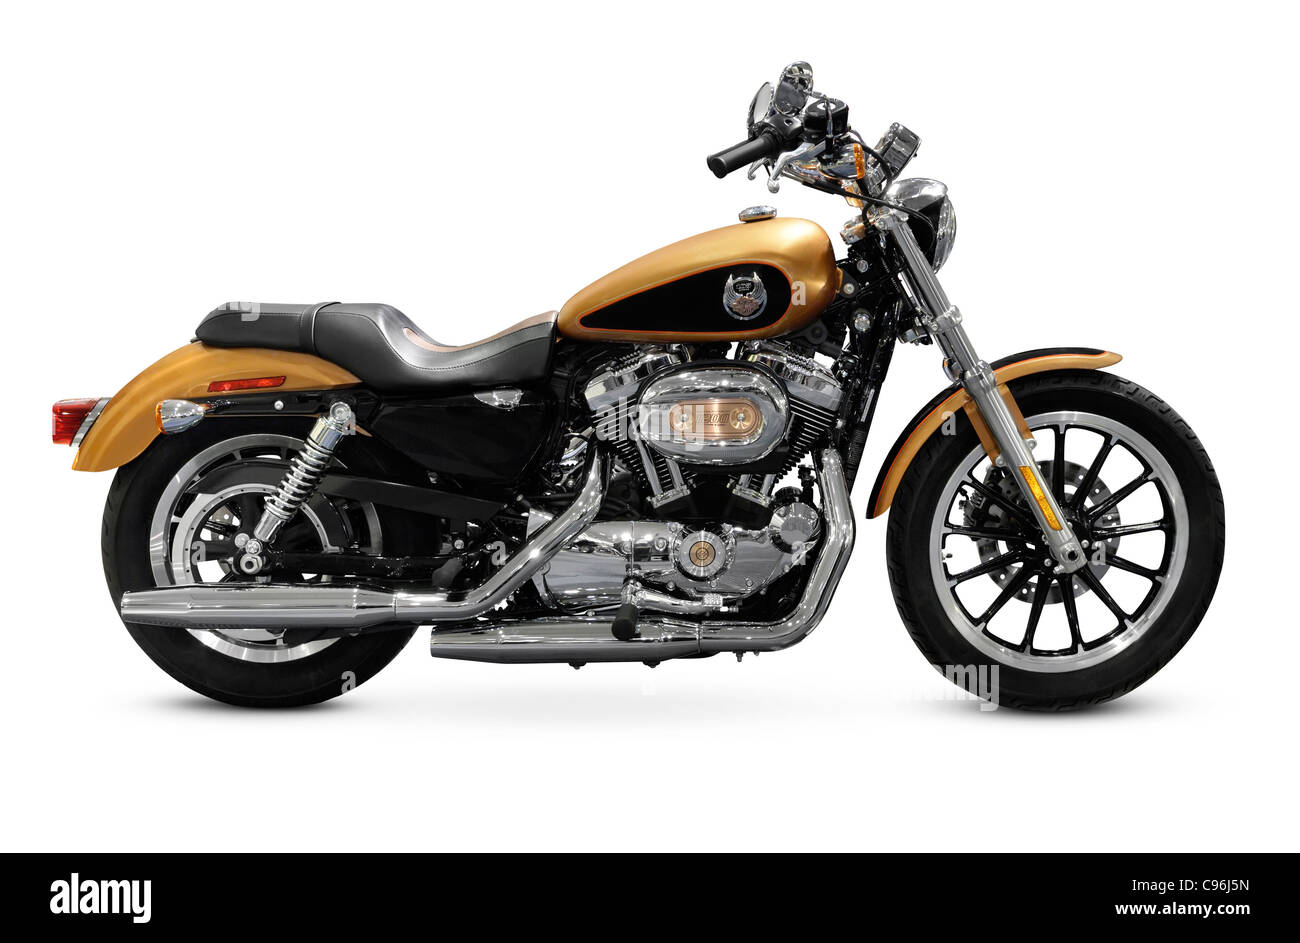 custom harley davidson motorcycles stockfotos custom. Black Bedroom Furniture Sets. Home Design Ideas